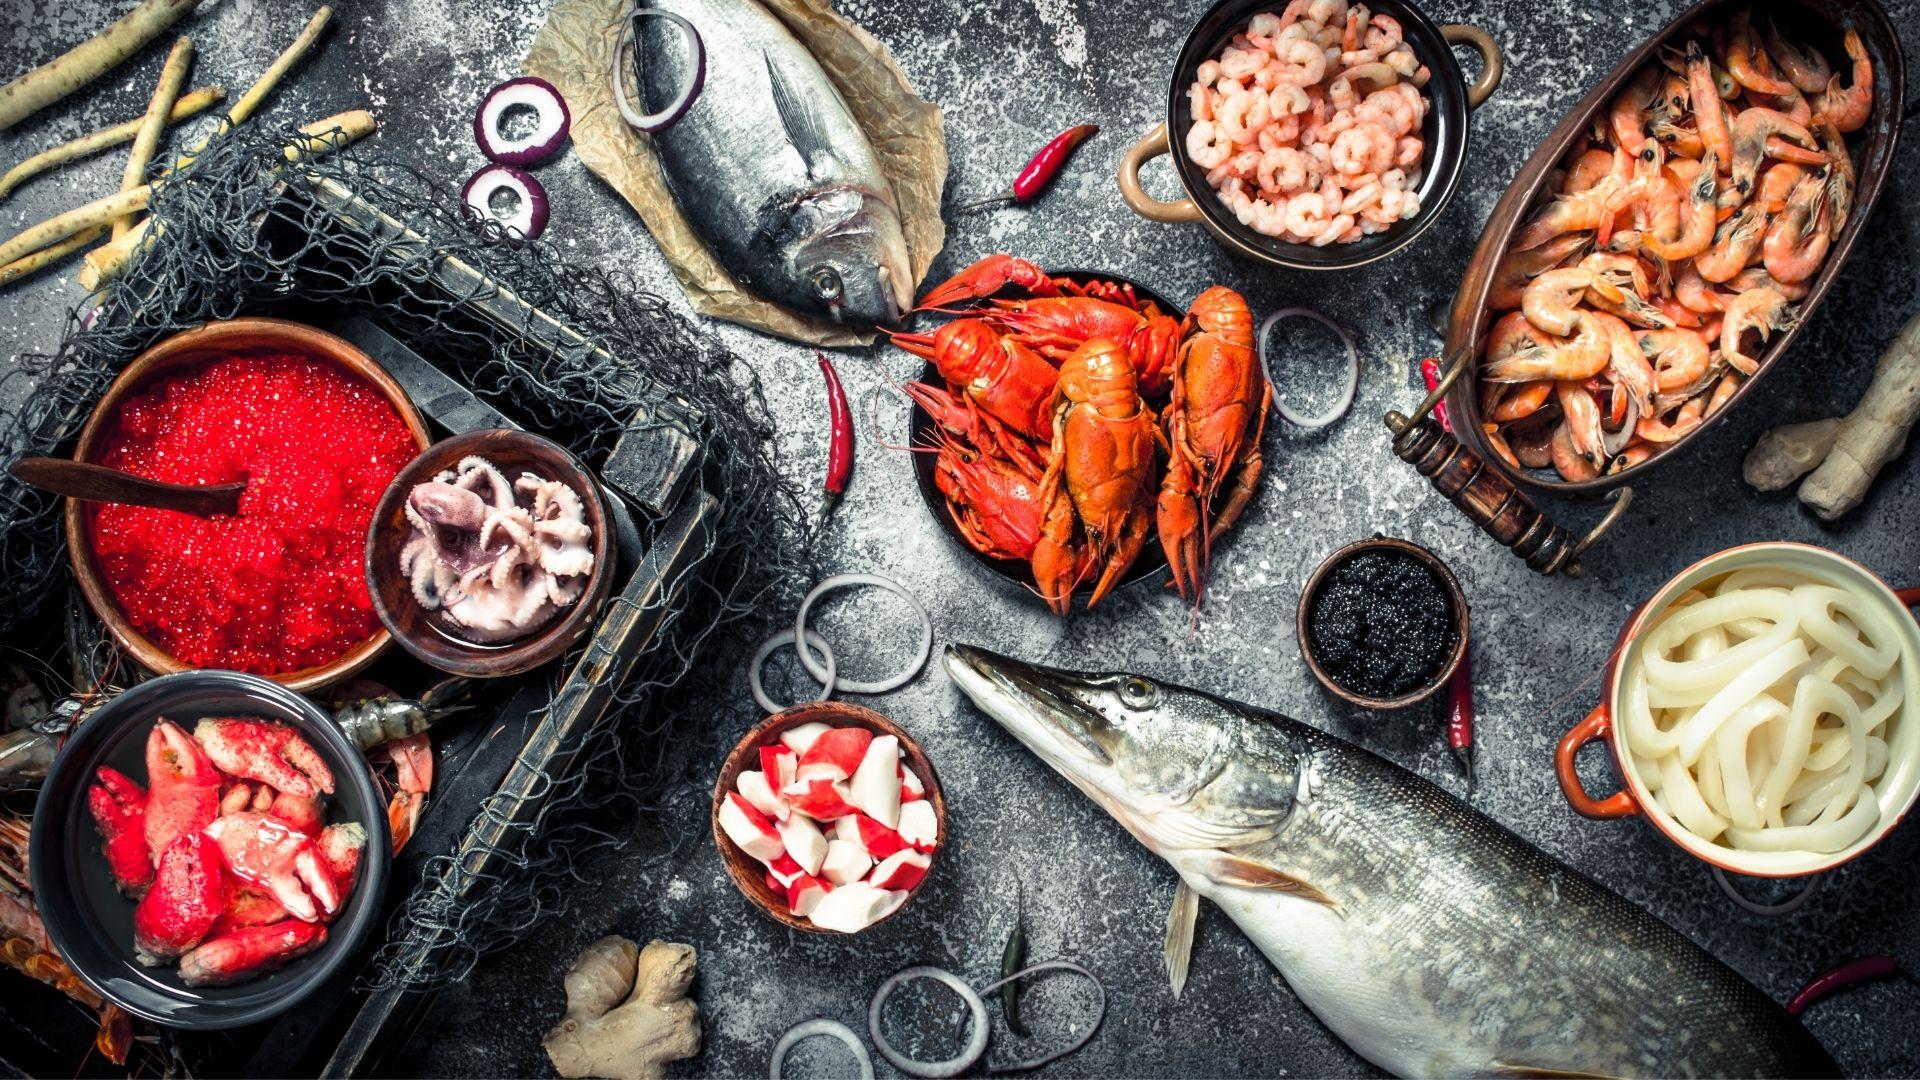 Délices de la mer : nos produits de la mer